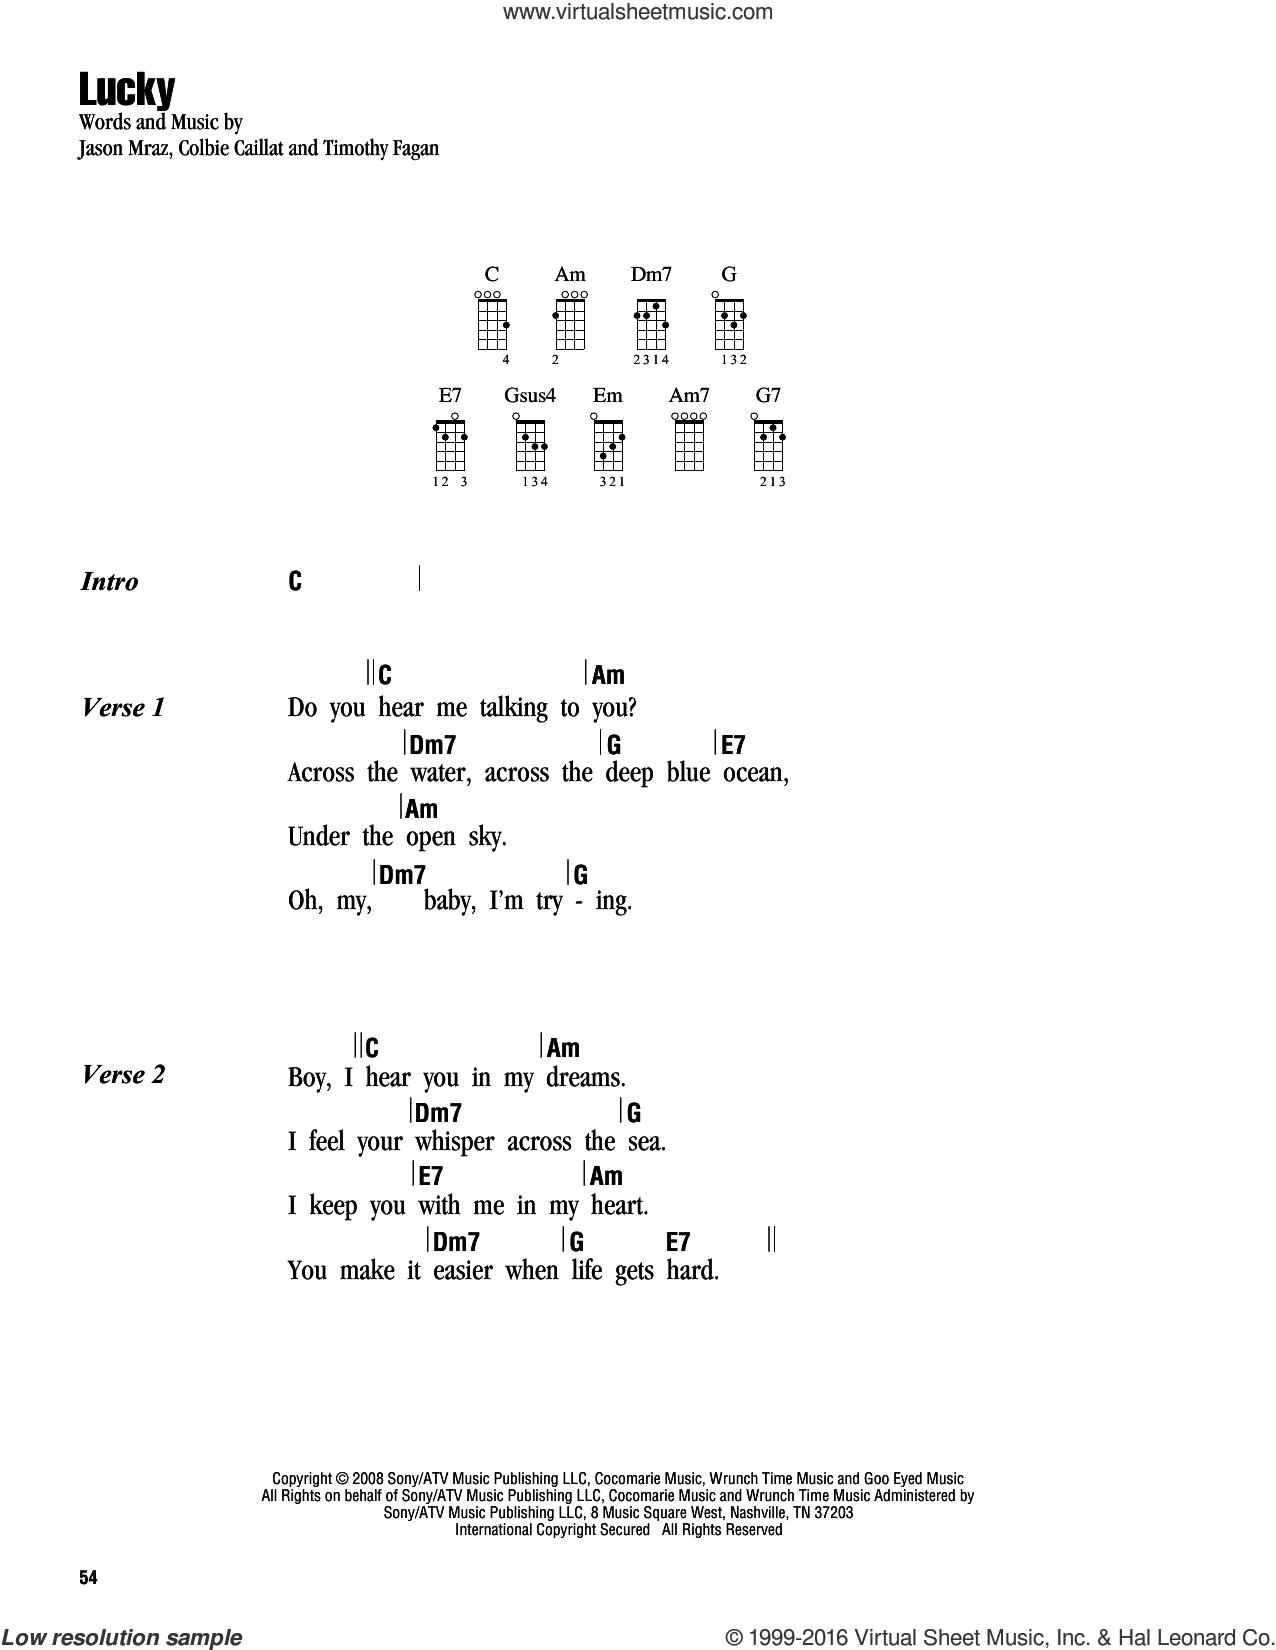 21 Guns Chords Caillat Lucky Sheet Music For Ukulele Chords Pdf